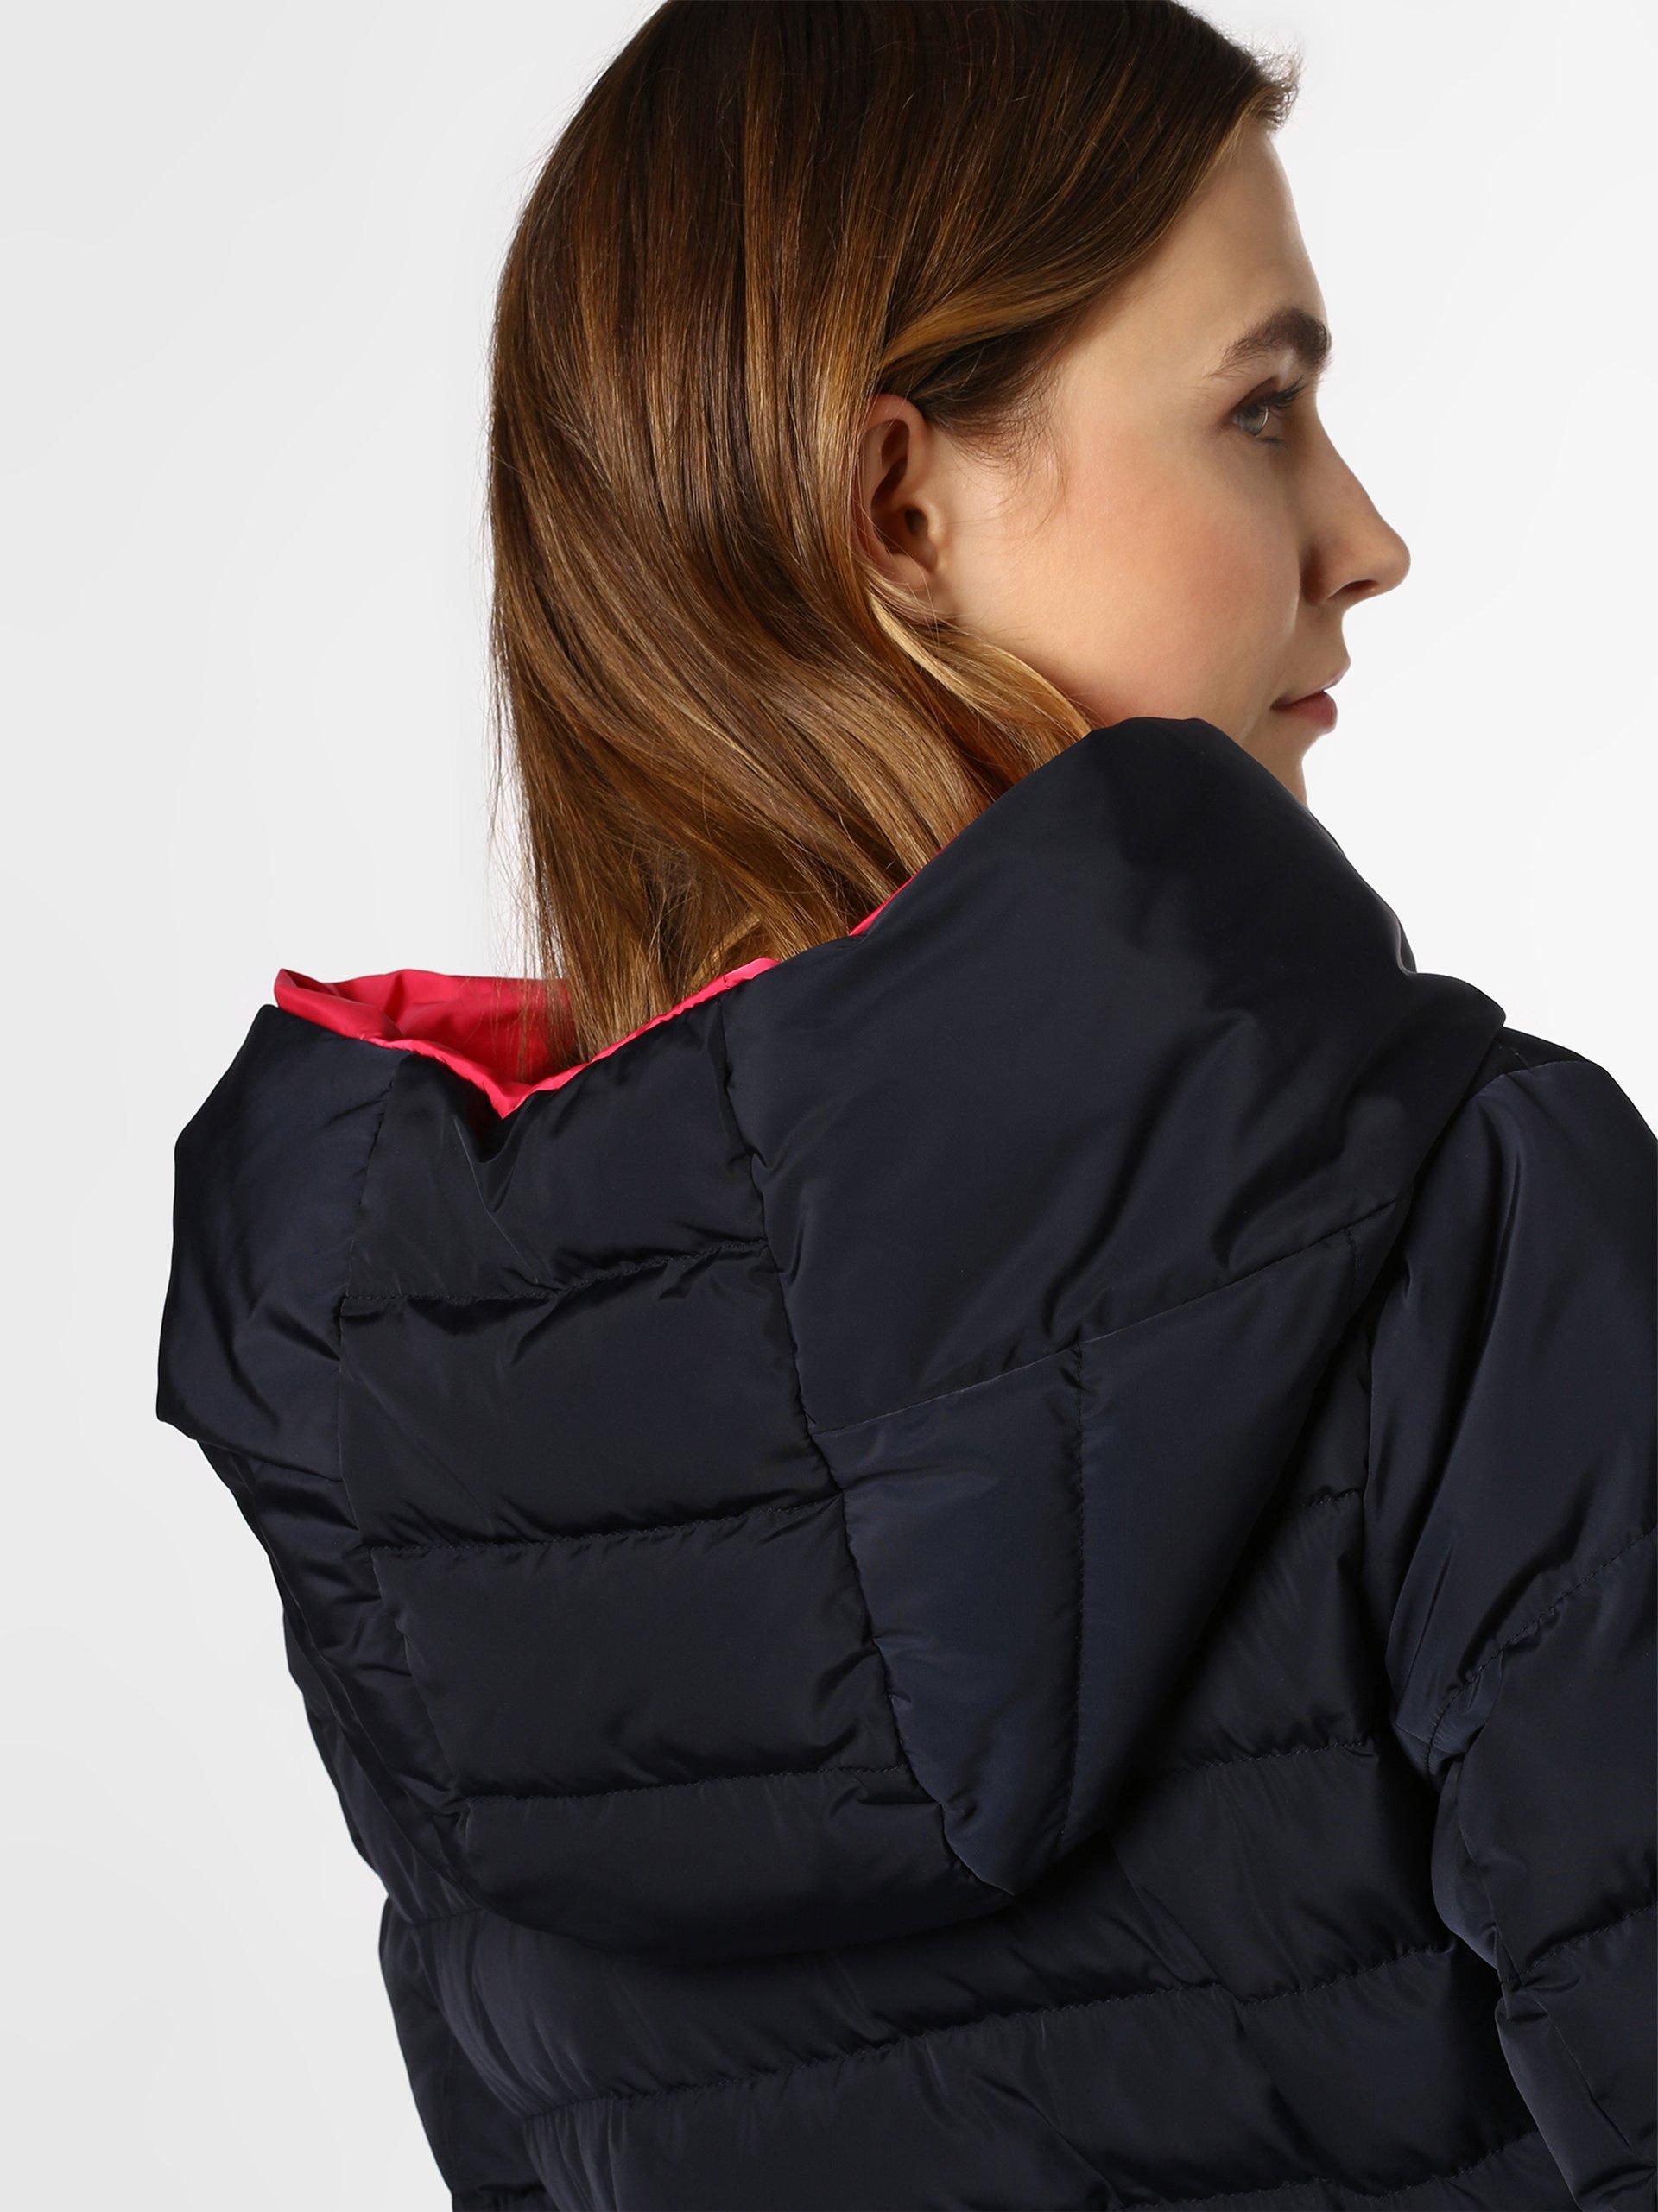 Rino & Pelle Dwustronny płaszcz pikowany damski